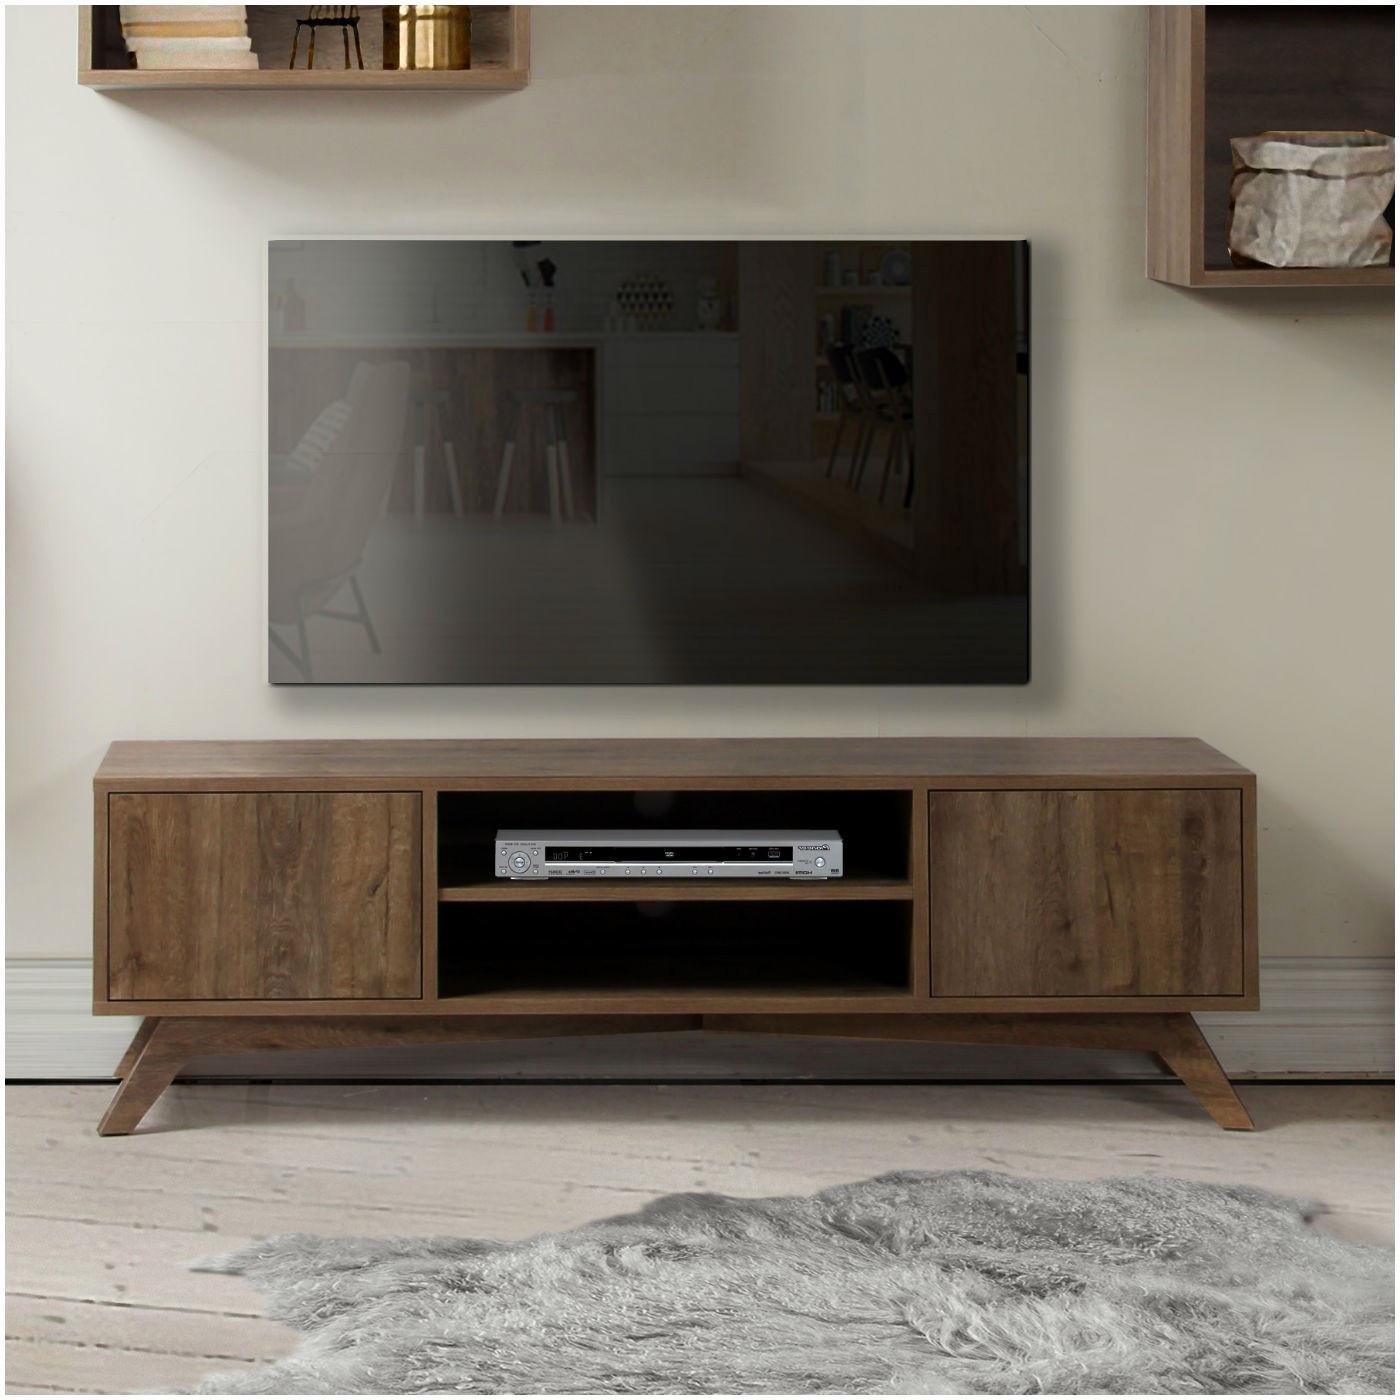 Meuble Tv Hifi Haut De Gamme Table Haute De Bar Vigando intérieur Meuble Tv Oskar But